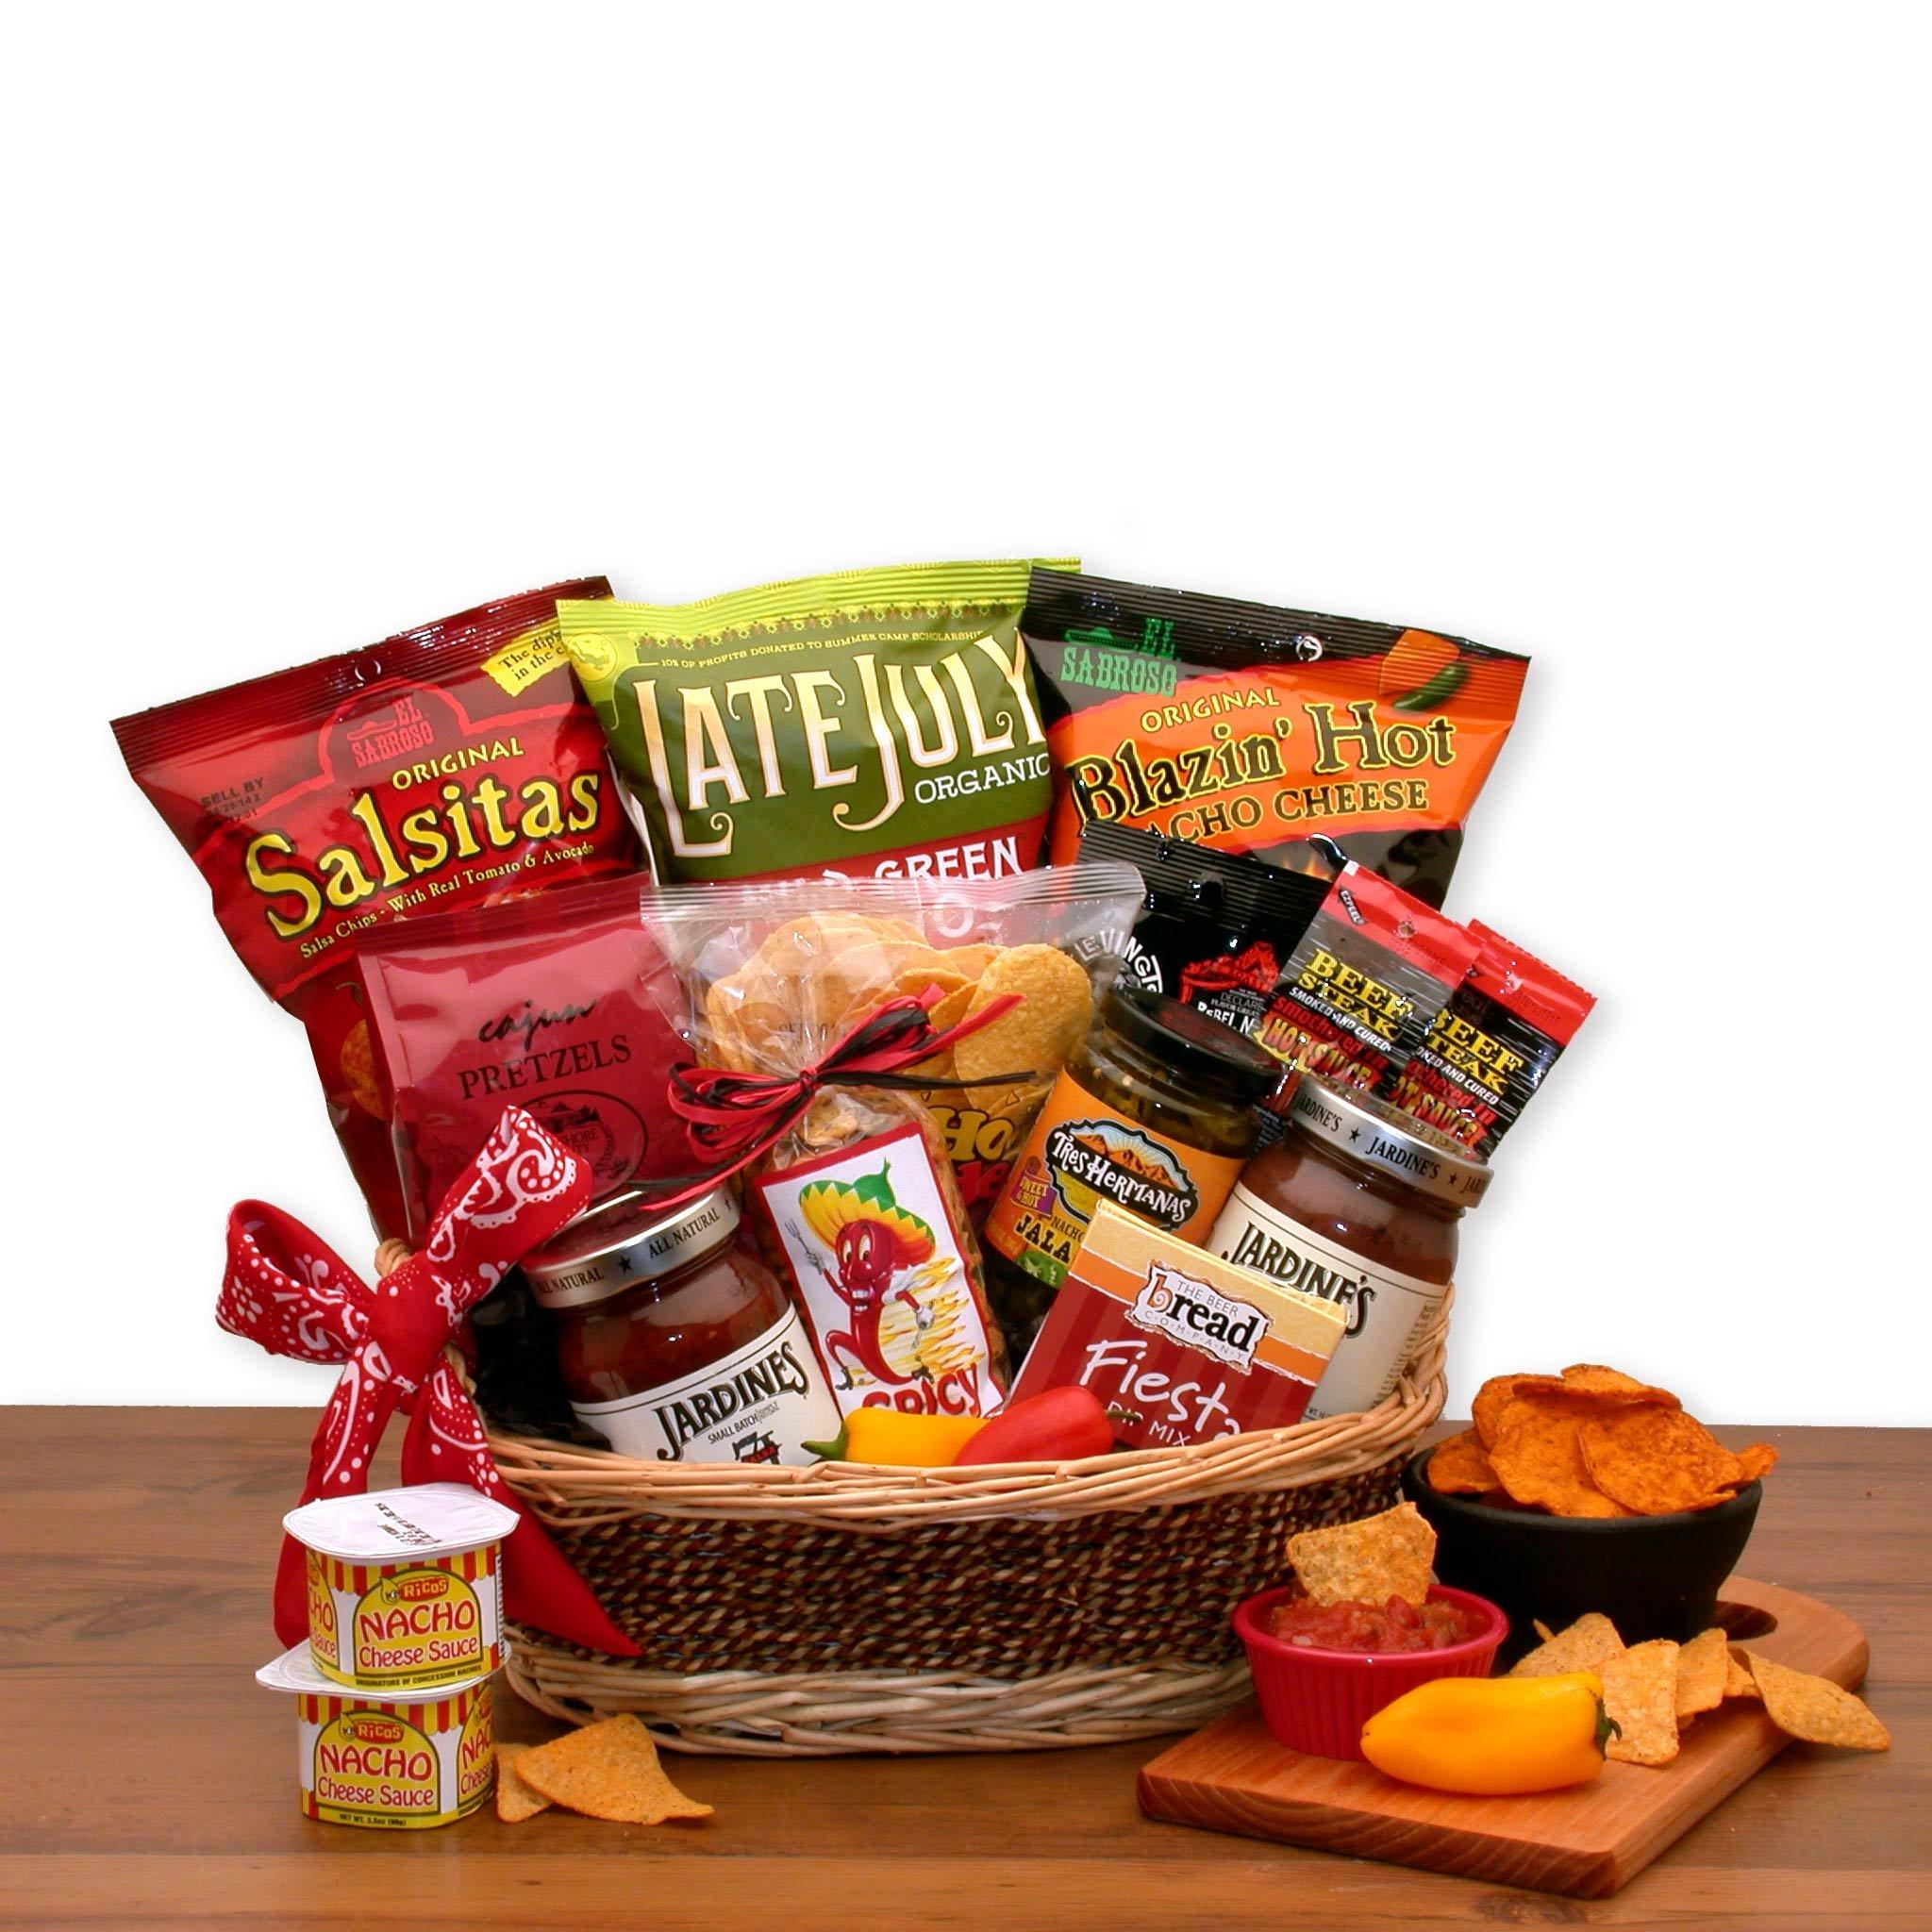 Snack Gift A Little Spice Chips & Salsa Gift Basket